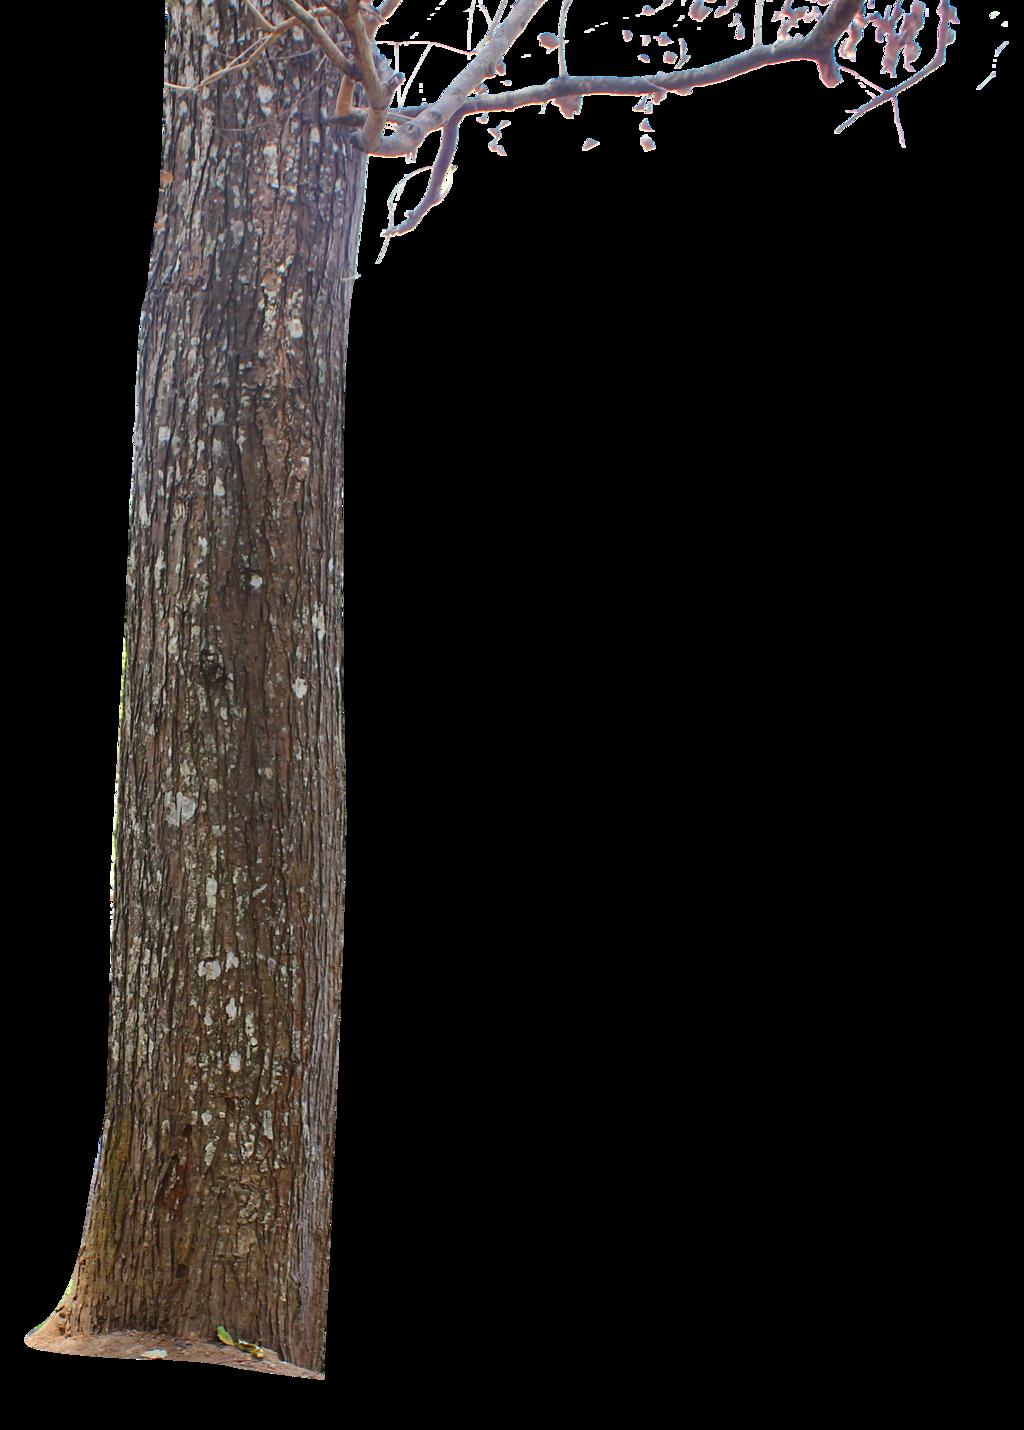 Tree Trunk By Andhikazanuar Tree Trunk By Andhikazanuar - PNG Tree Trunk